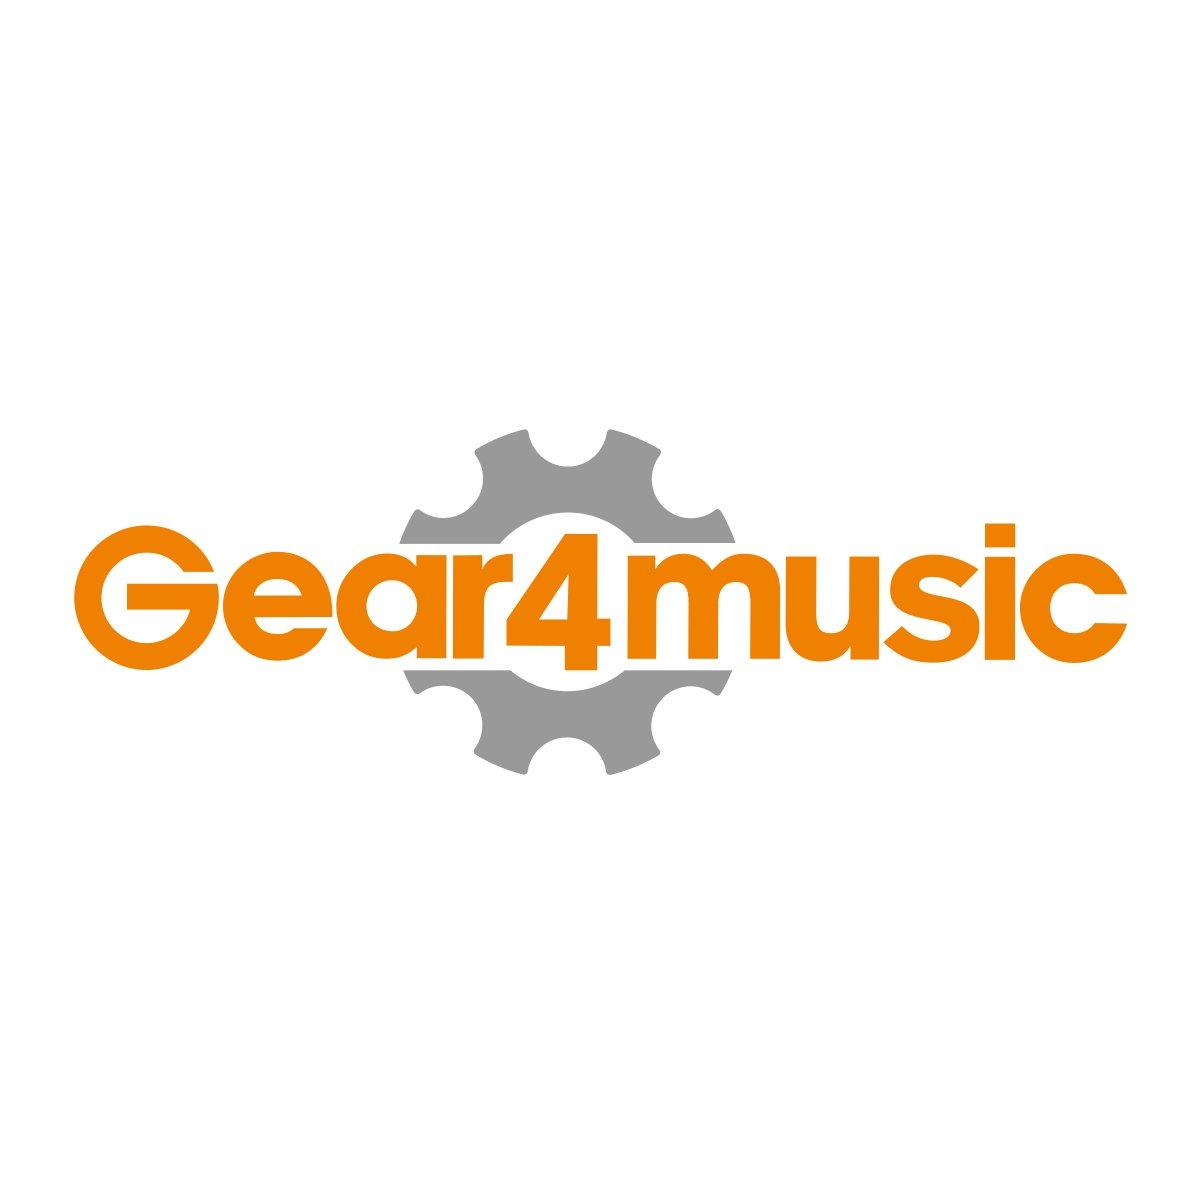 stentor rockabilly double bass black 3 4 at gear4music. Black Bedroom Furniture Sets. Home Design Ideas